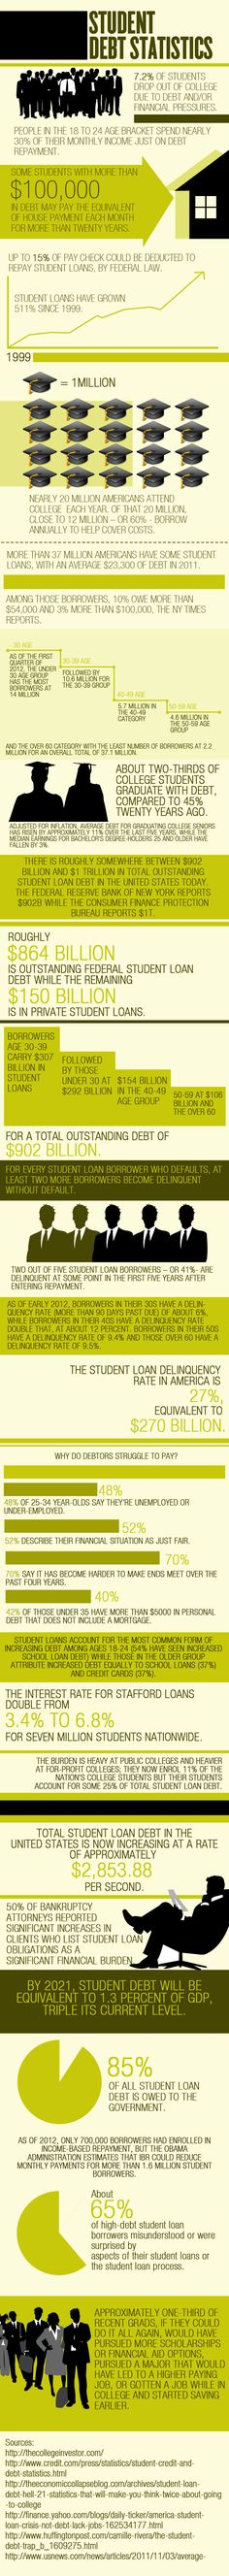 Student Loan Debt Infographic #outwithstudentdebt #studentdebtcrisis